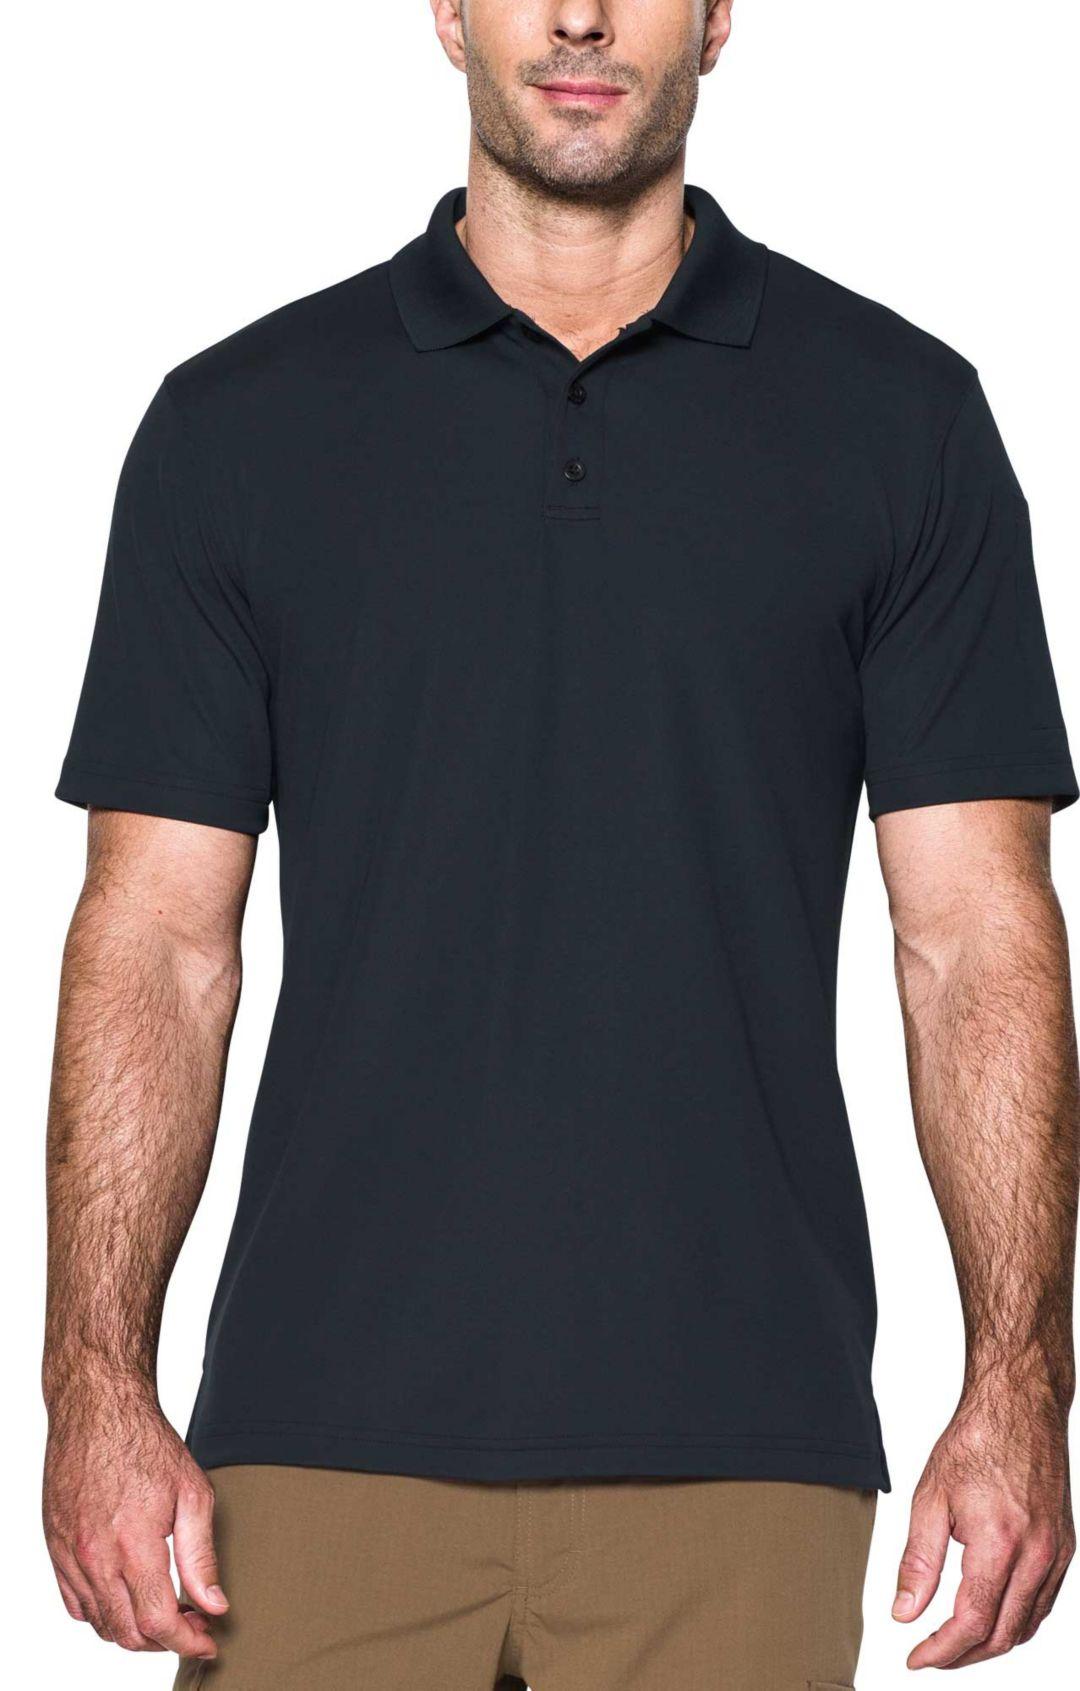 67501c512 Under Armour Men s Tactical Performance Short Sleeve Polo 1